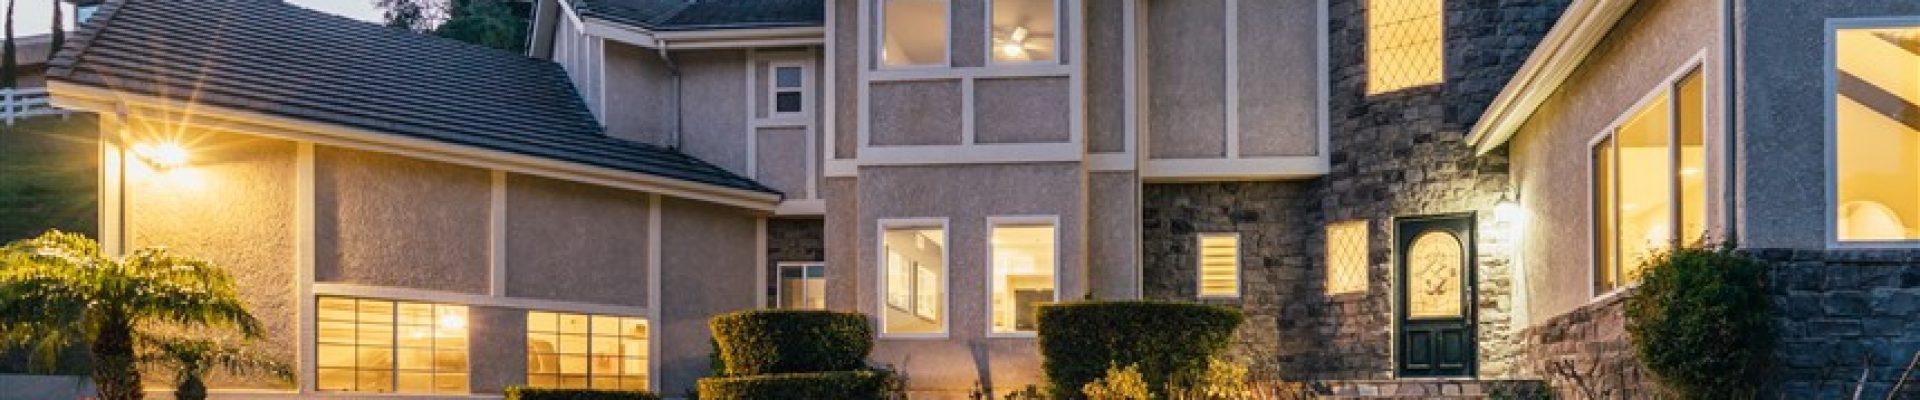 MW-IA074_house_20200211121301_NS.jpg